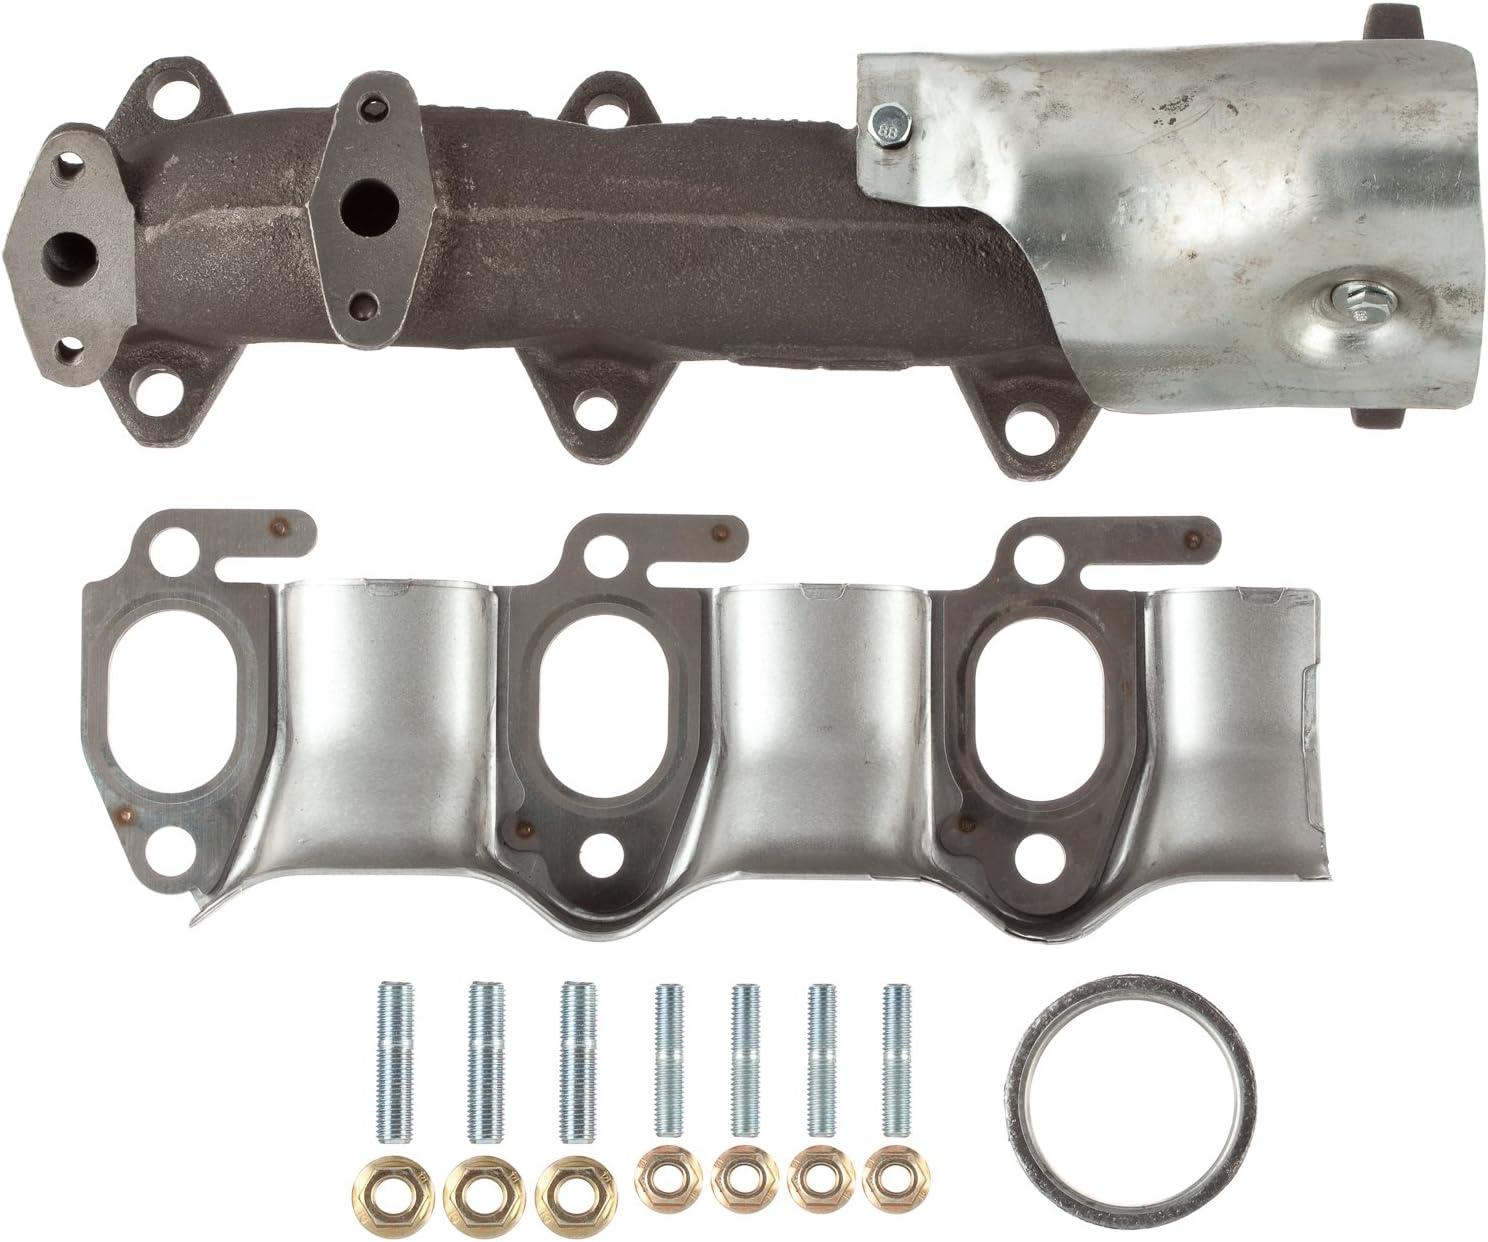 ATP Automotive Graywerks 101232 Exhaust Manifold